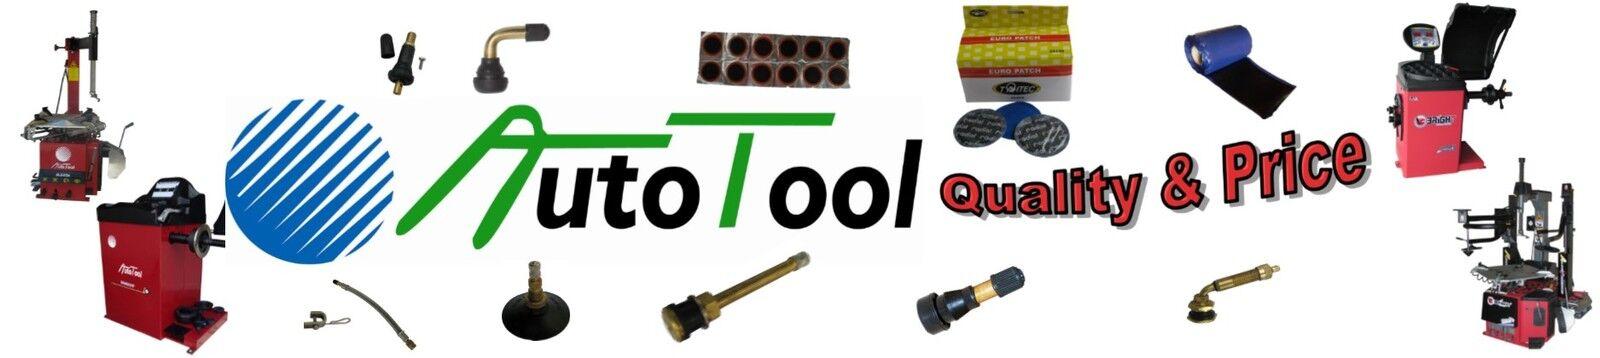 AutoTool